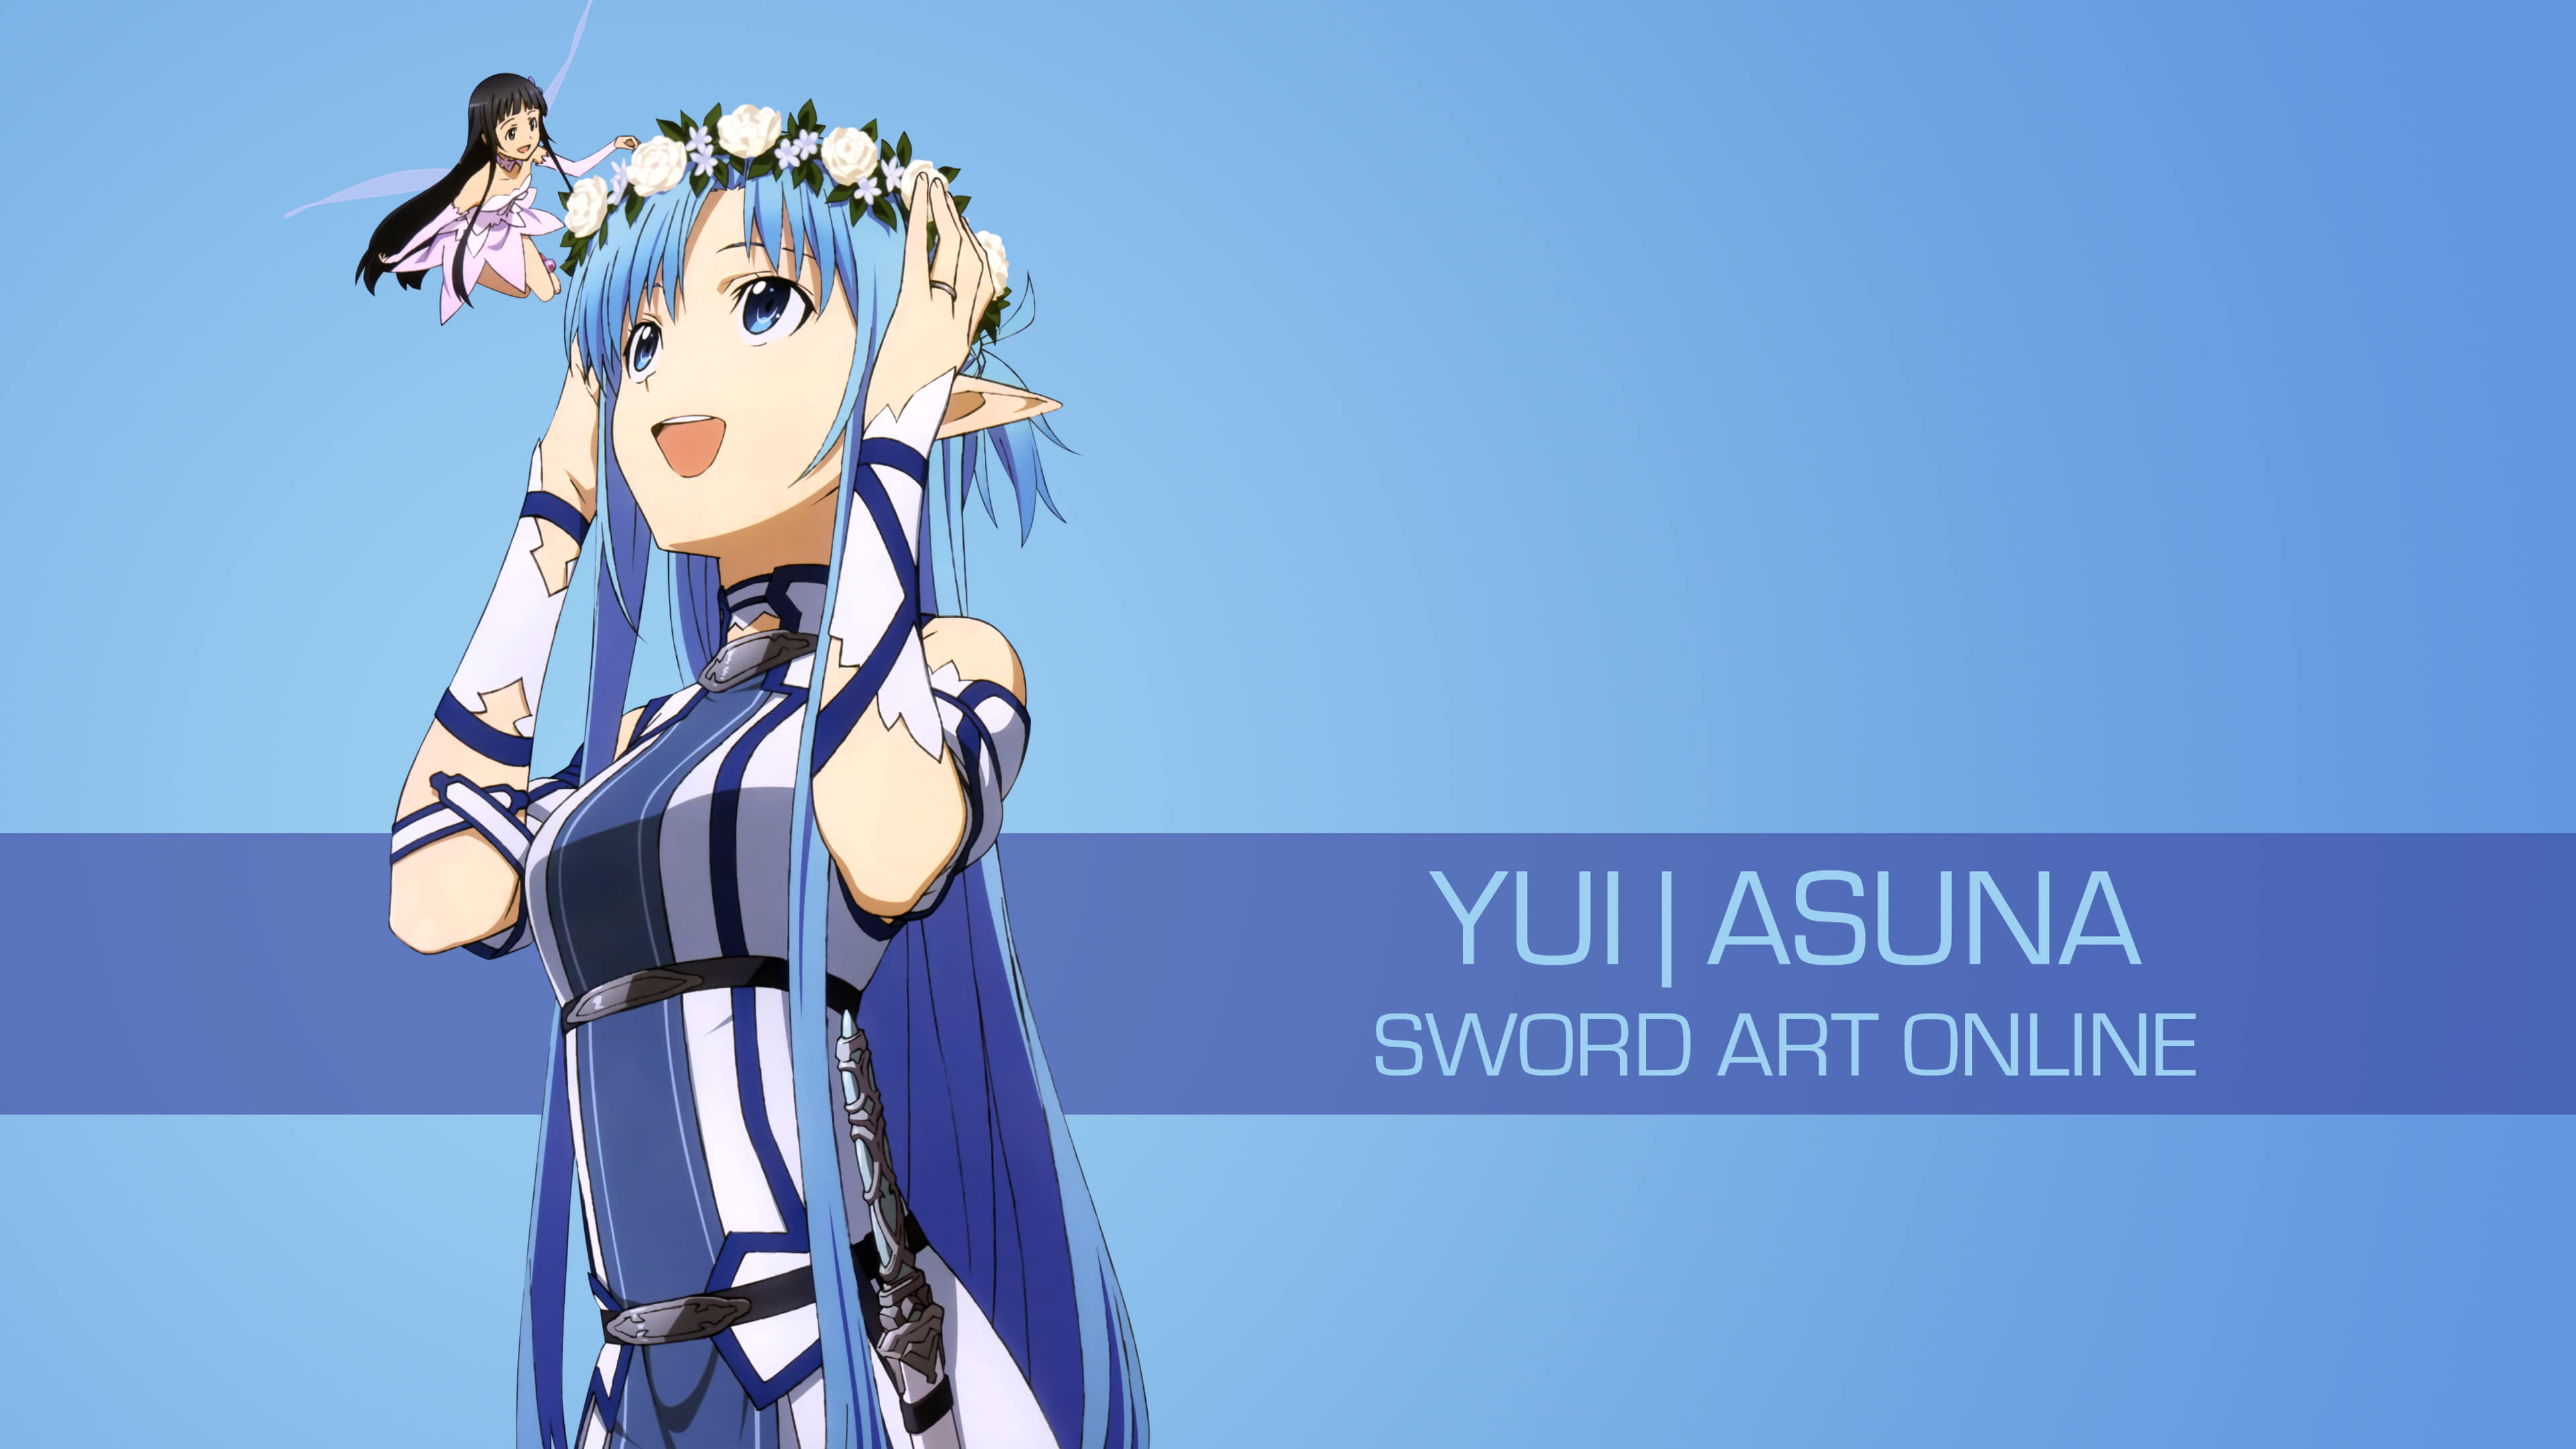 Yui Asuna Sword Art Online UHD 4K Wallpaper | Pixelz Sword Art Online Wallpaper 1920x1080 Yui